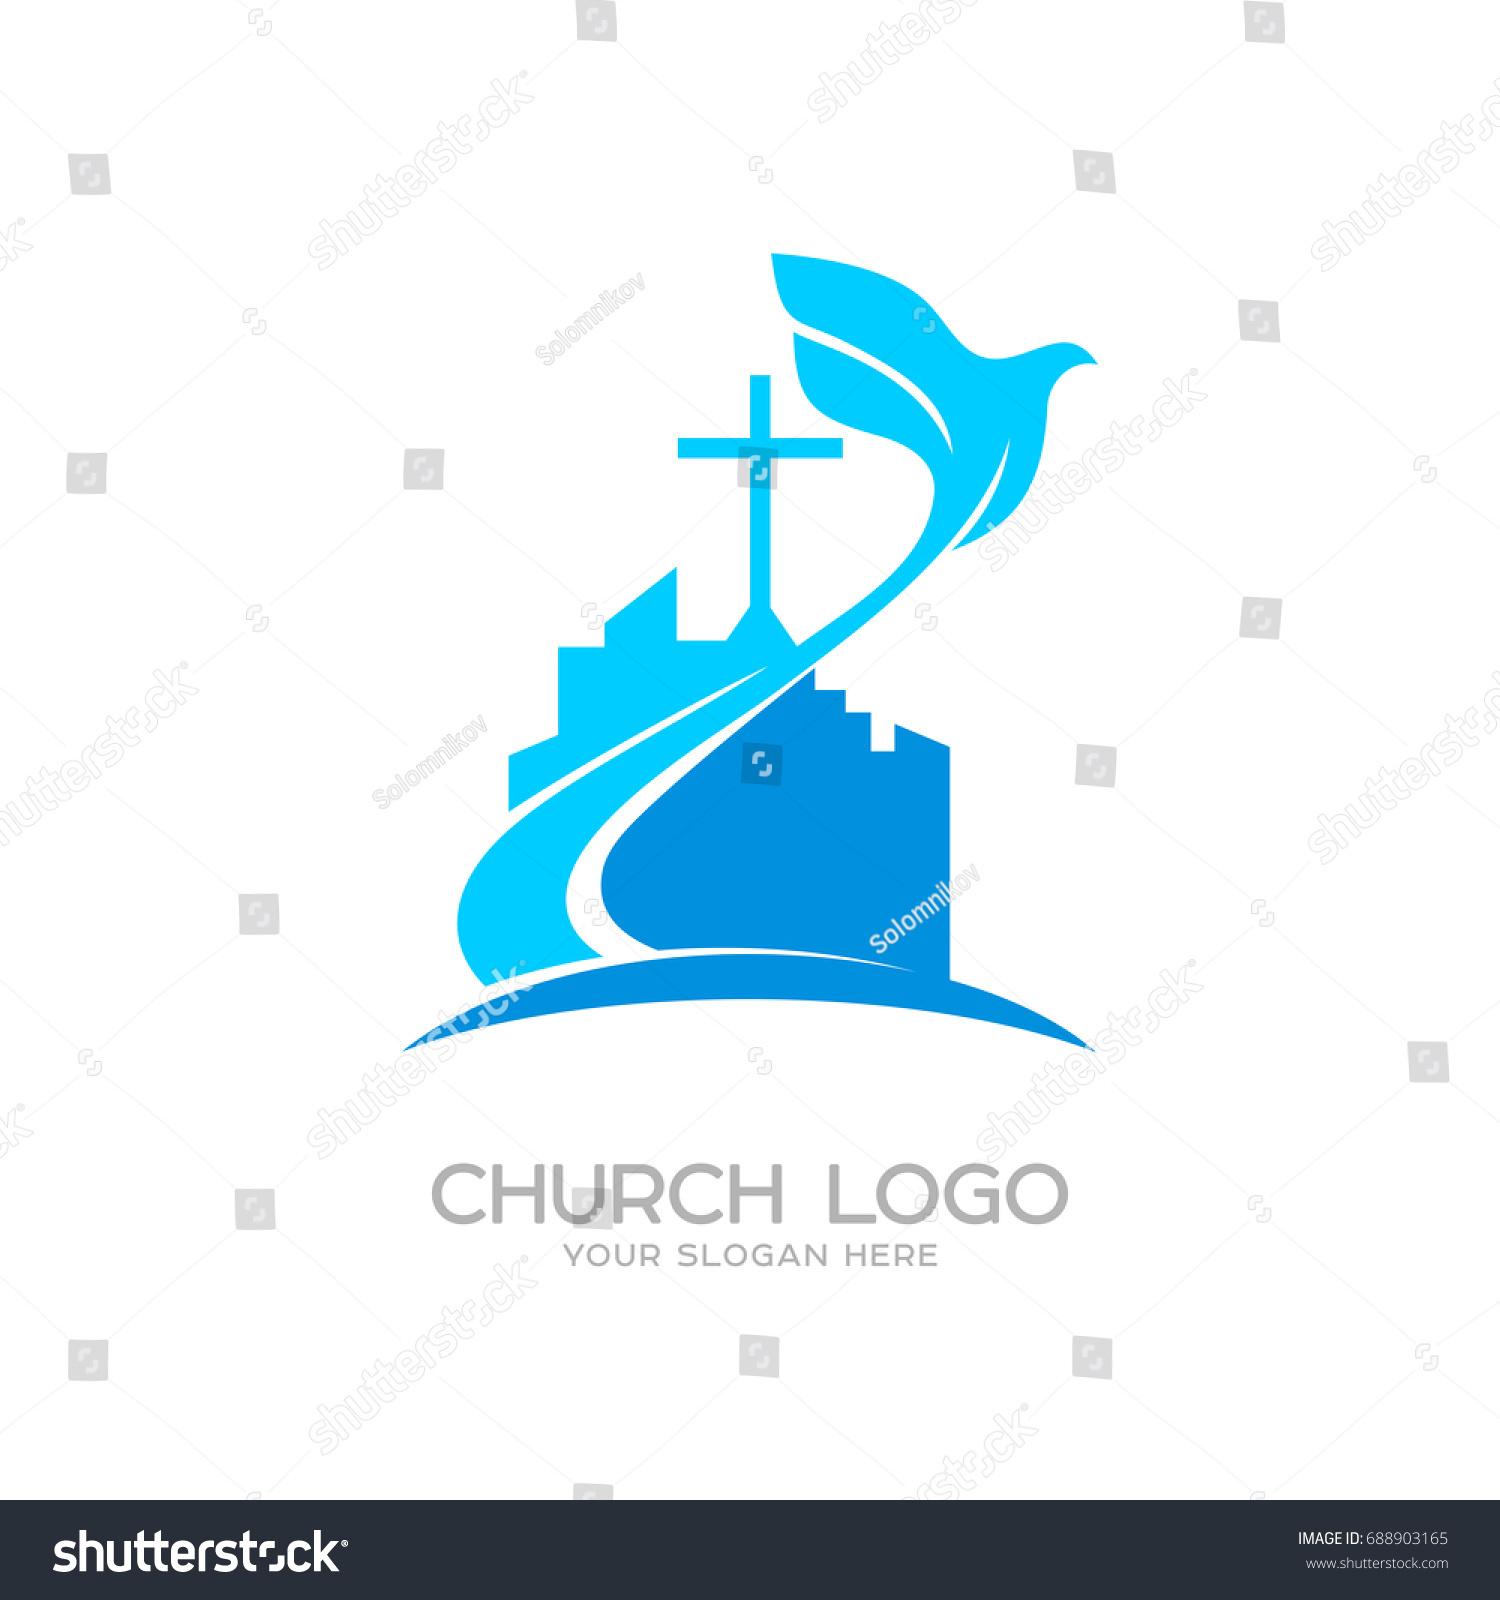 Church logo christian symbols cross jesus stock vector 688903165 church logo christian symbols cross jesus stock vector 688903165 shutterstock thecheapjerseys Gallery